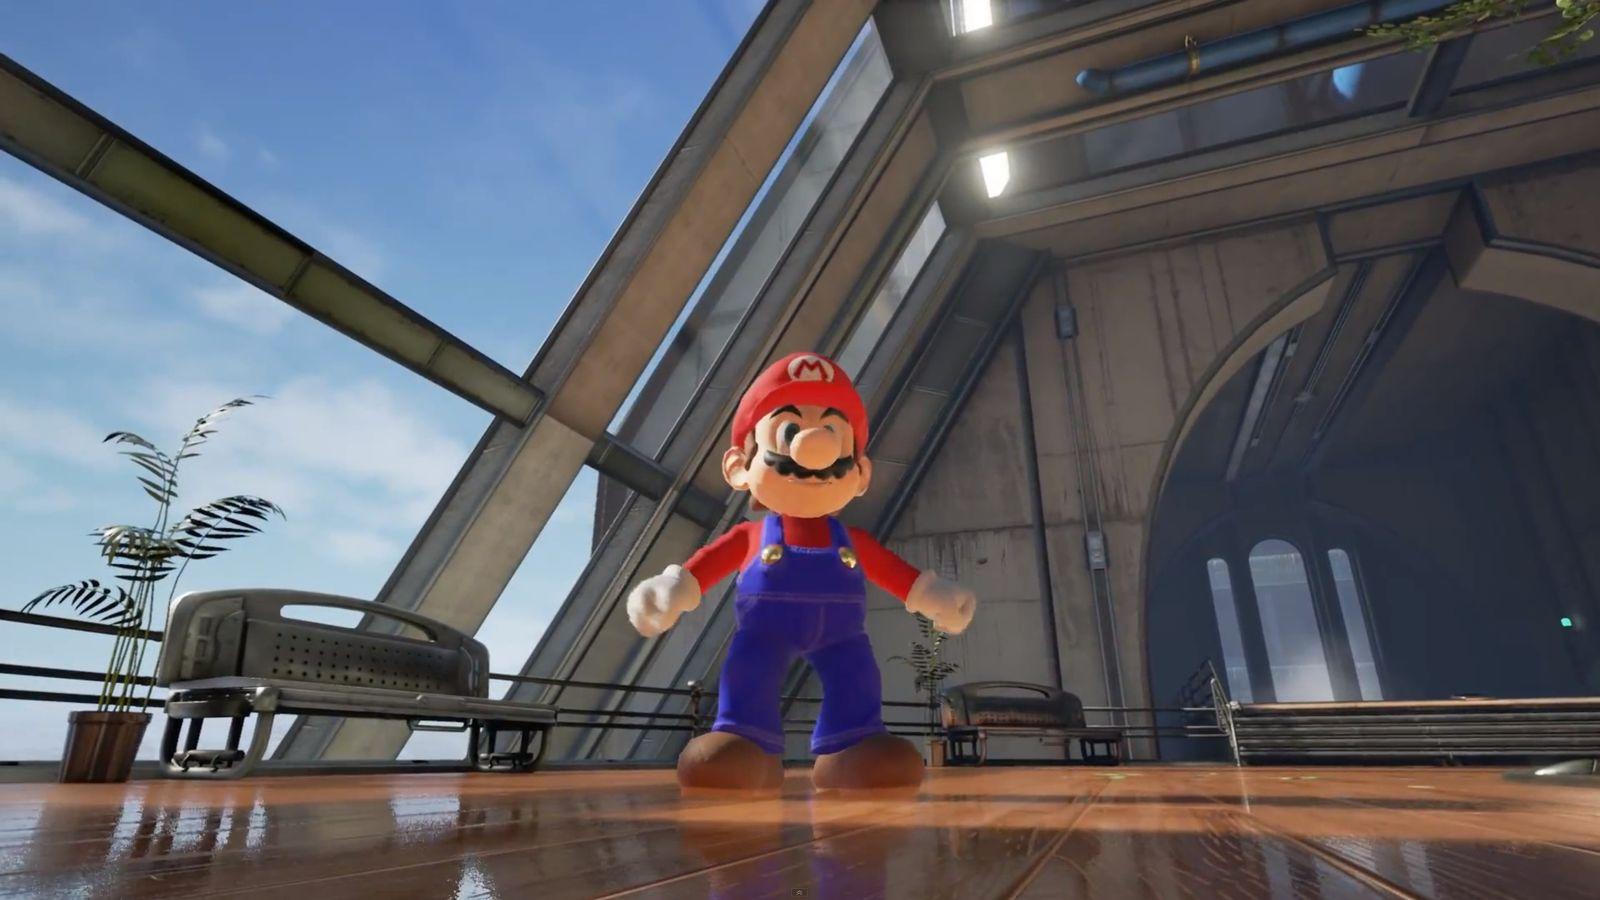 NUR ALS ZITAT Screenshot Super Mario in Unreal 4